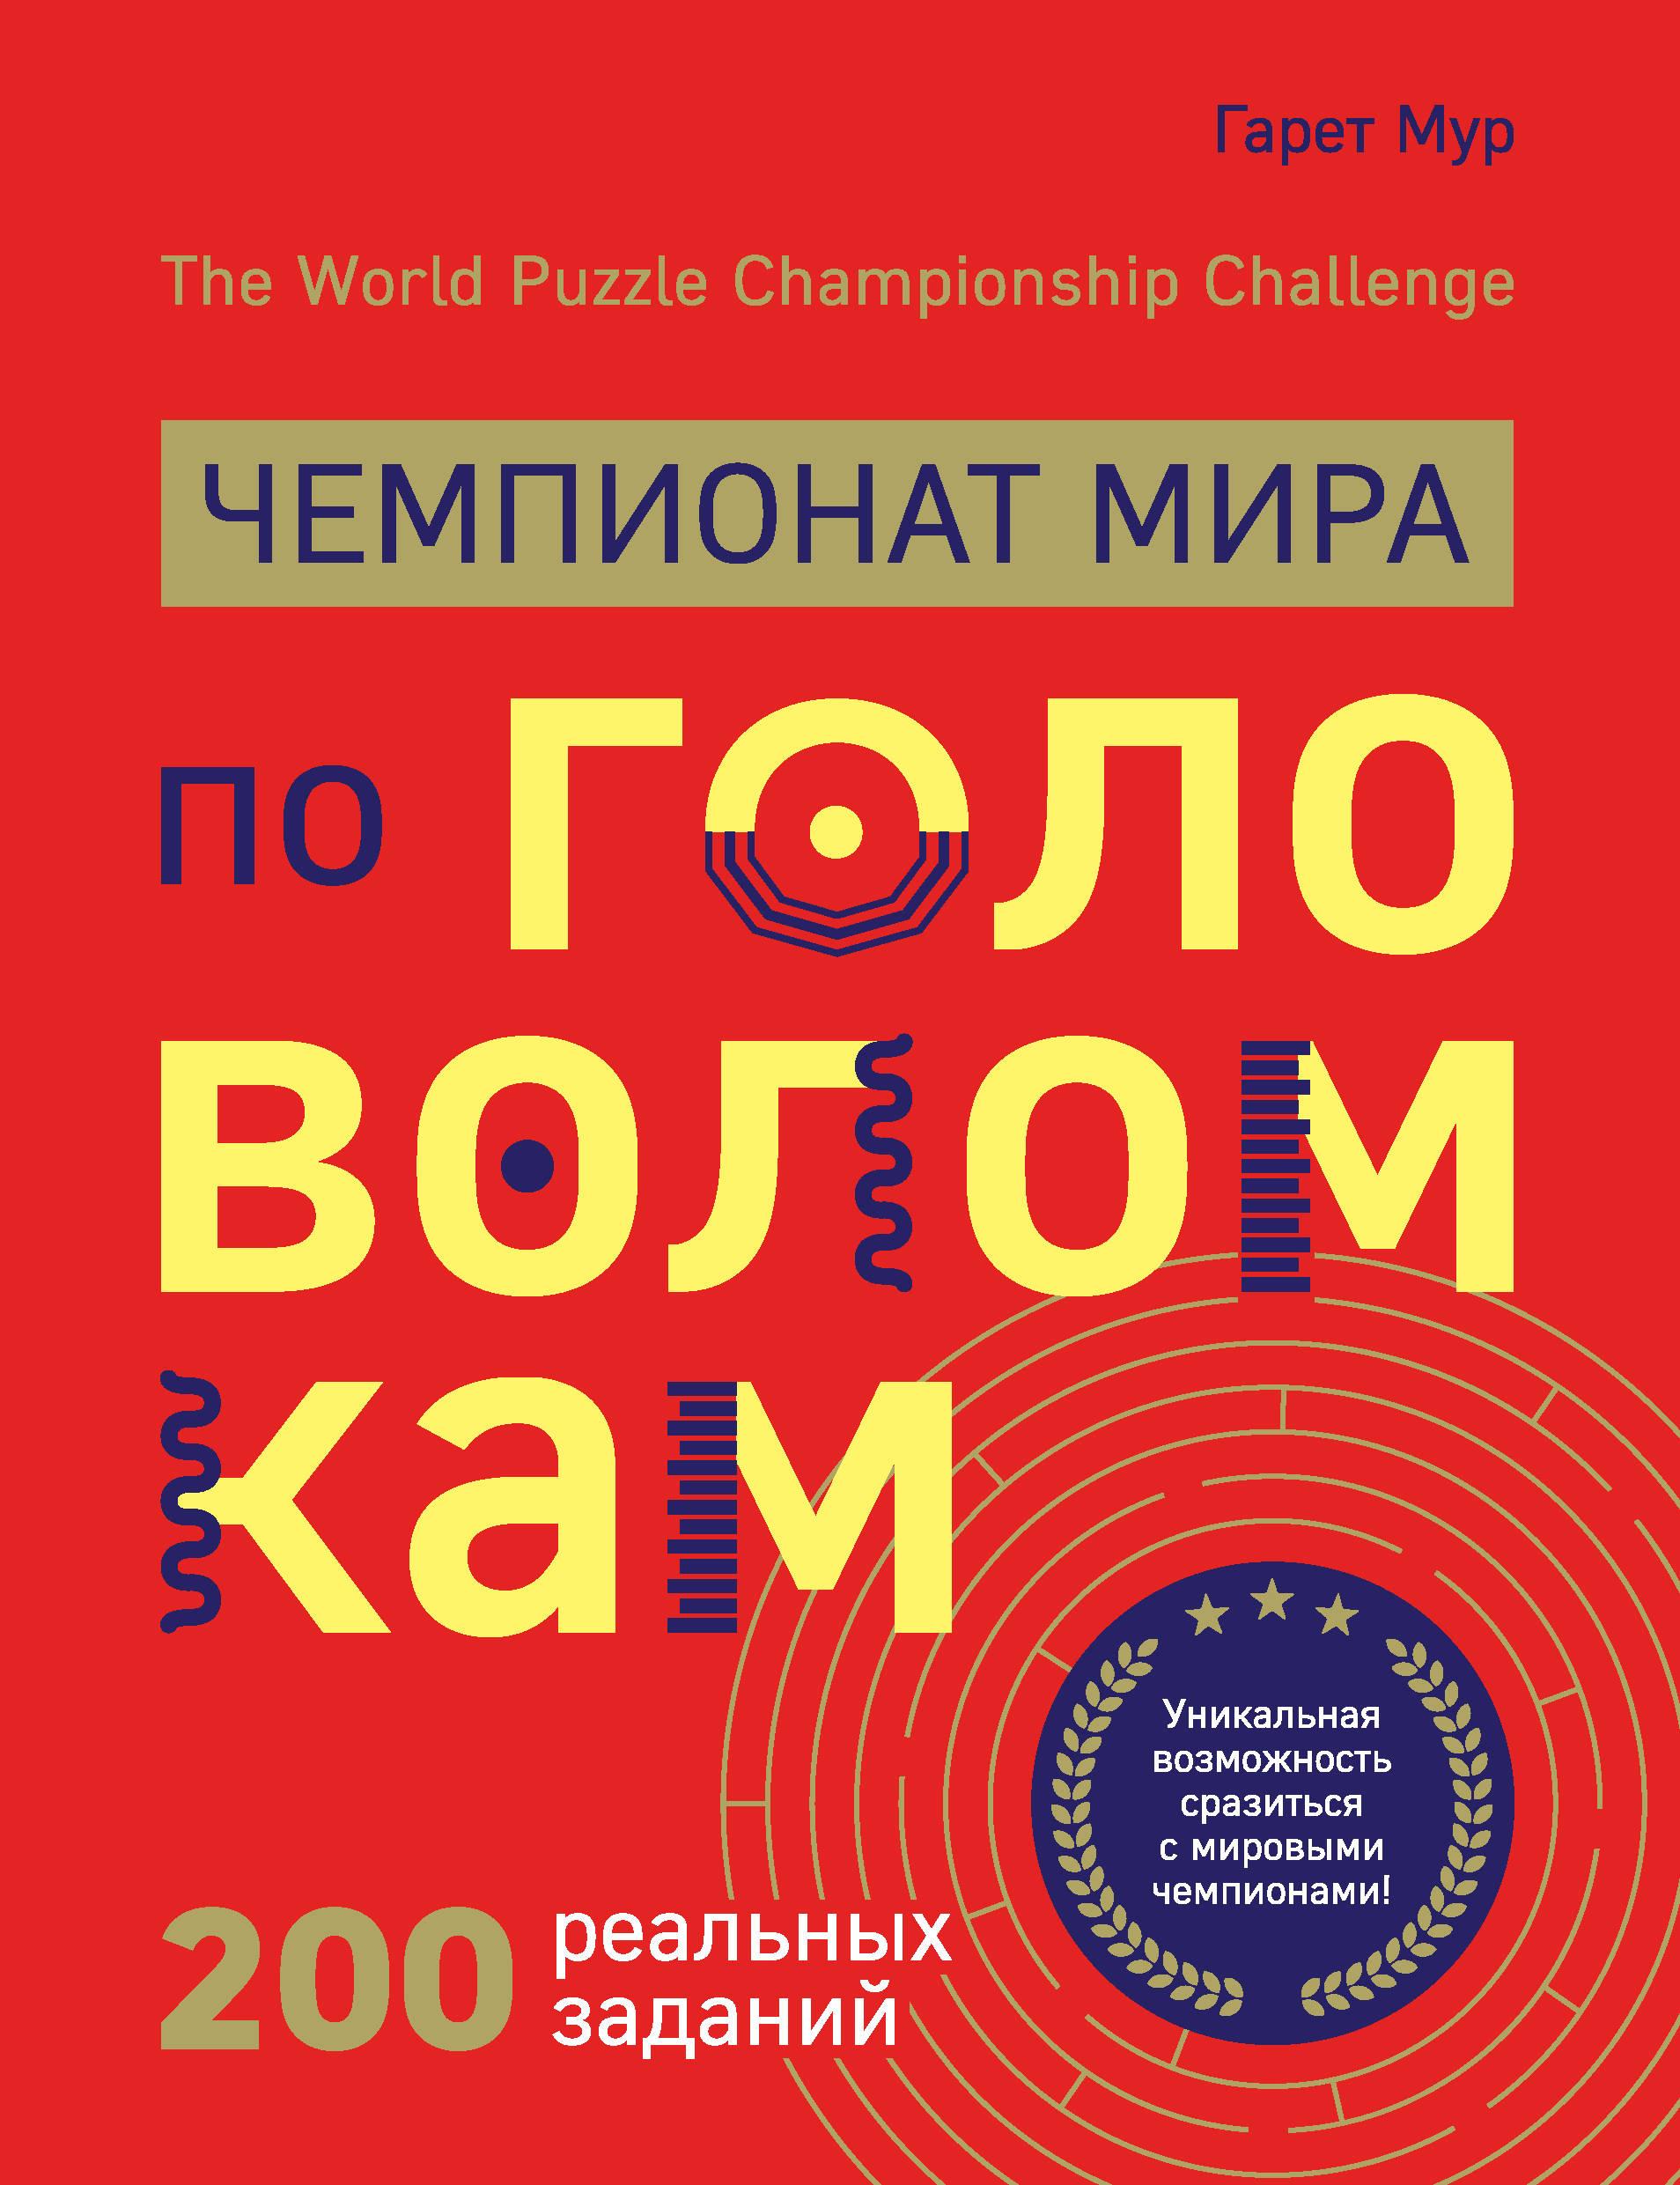 Chempionat mira po golovolomkam. The World Puzzle Championship Challenge. 200 realnykh zadanij